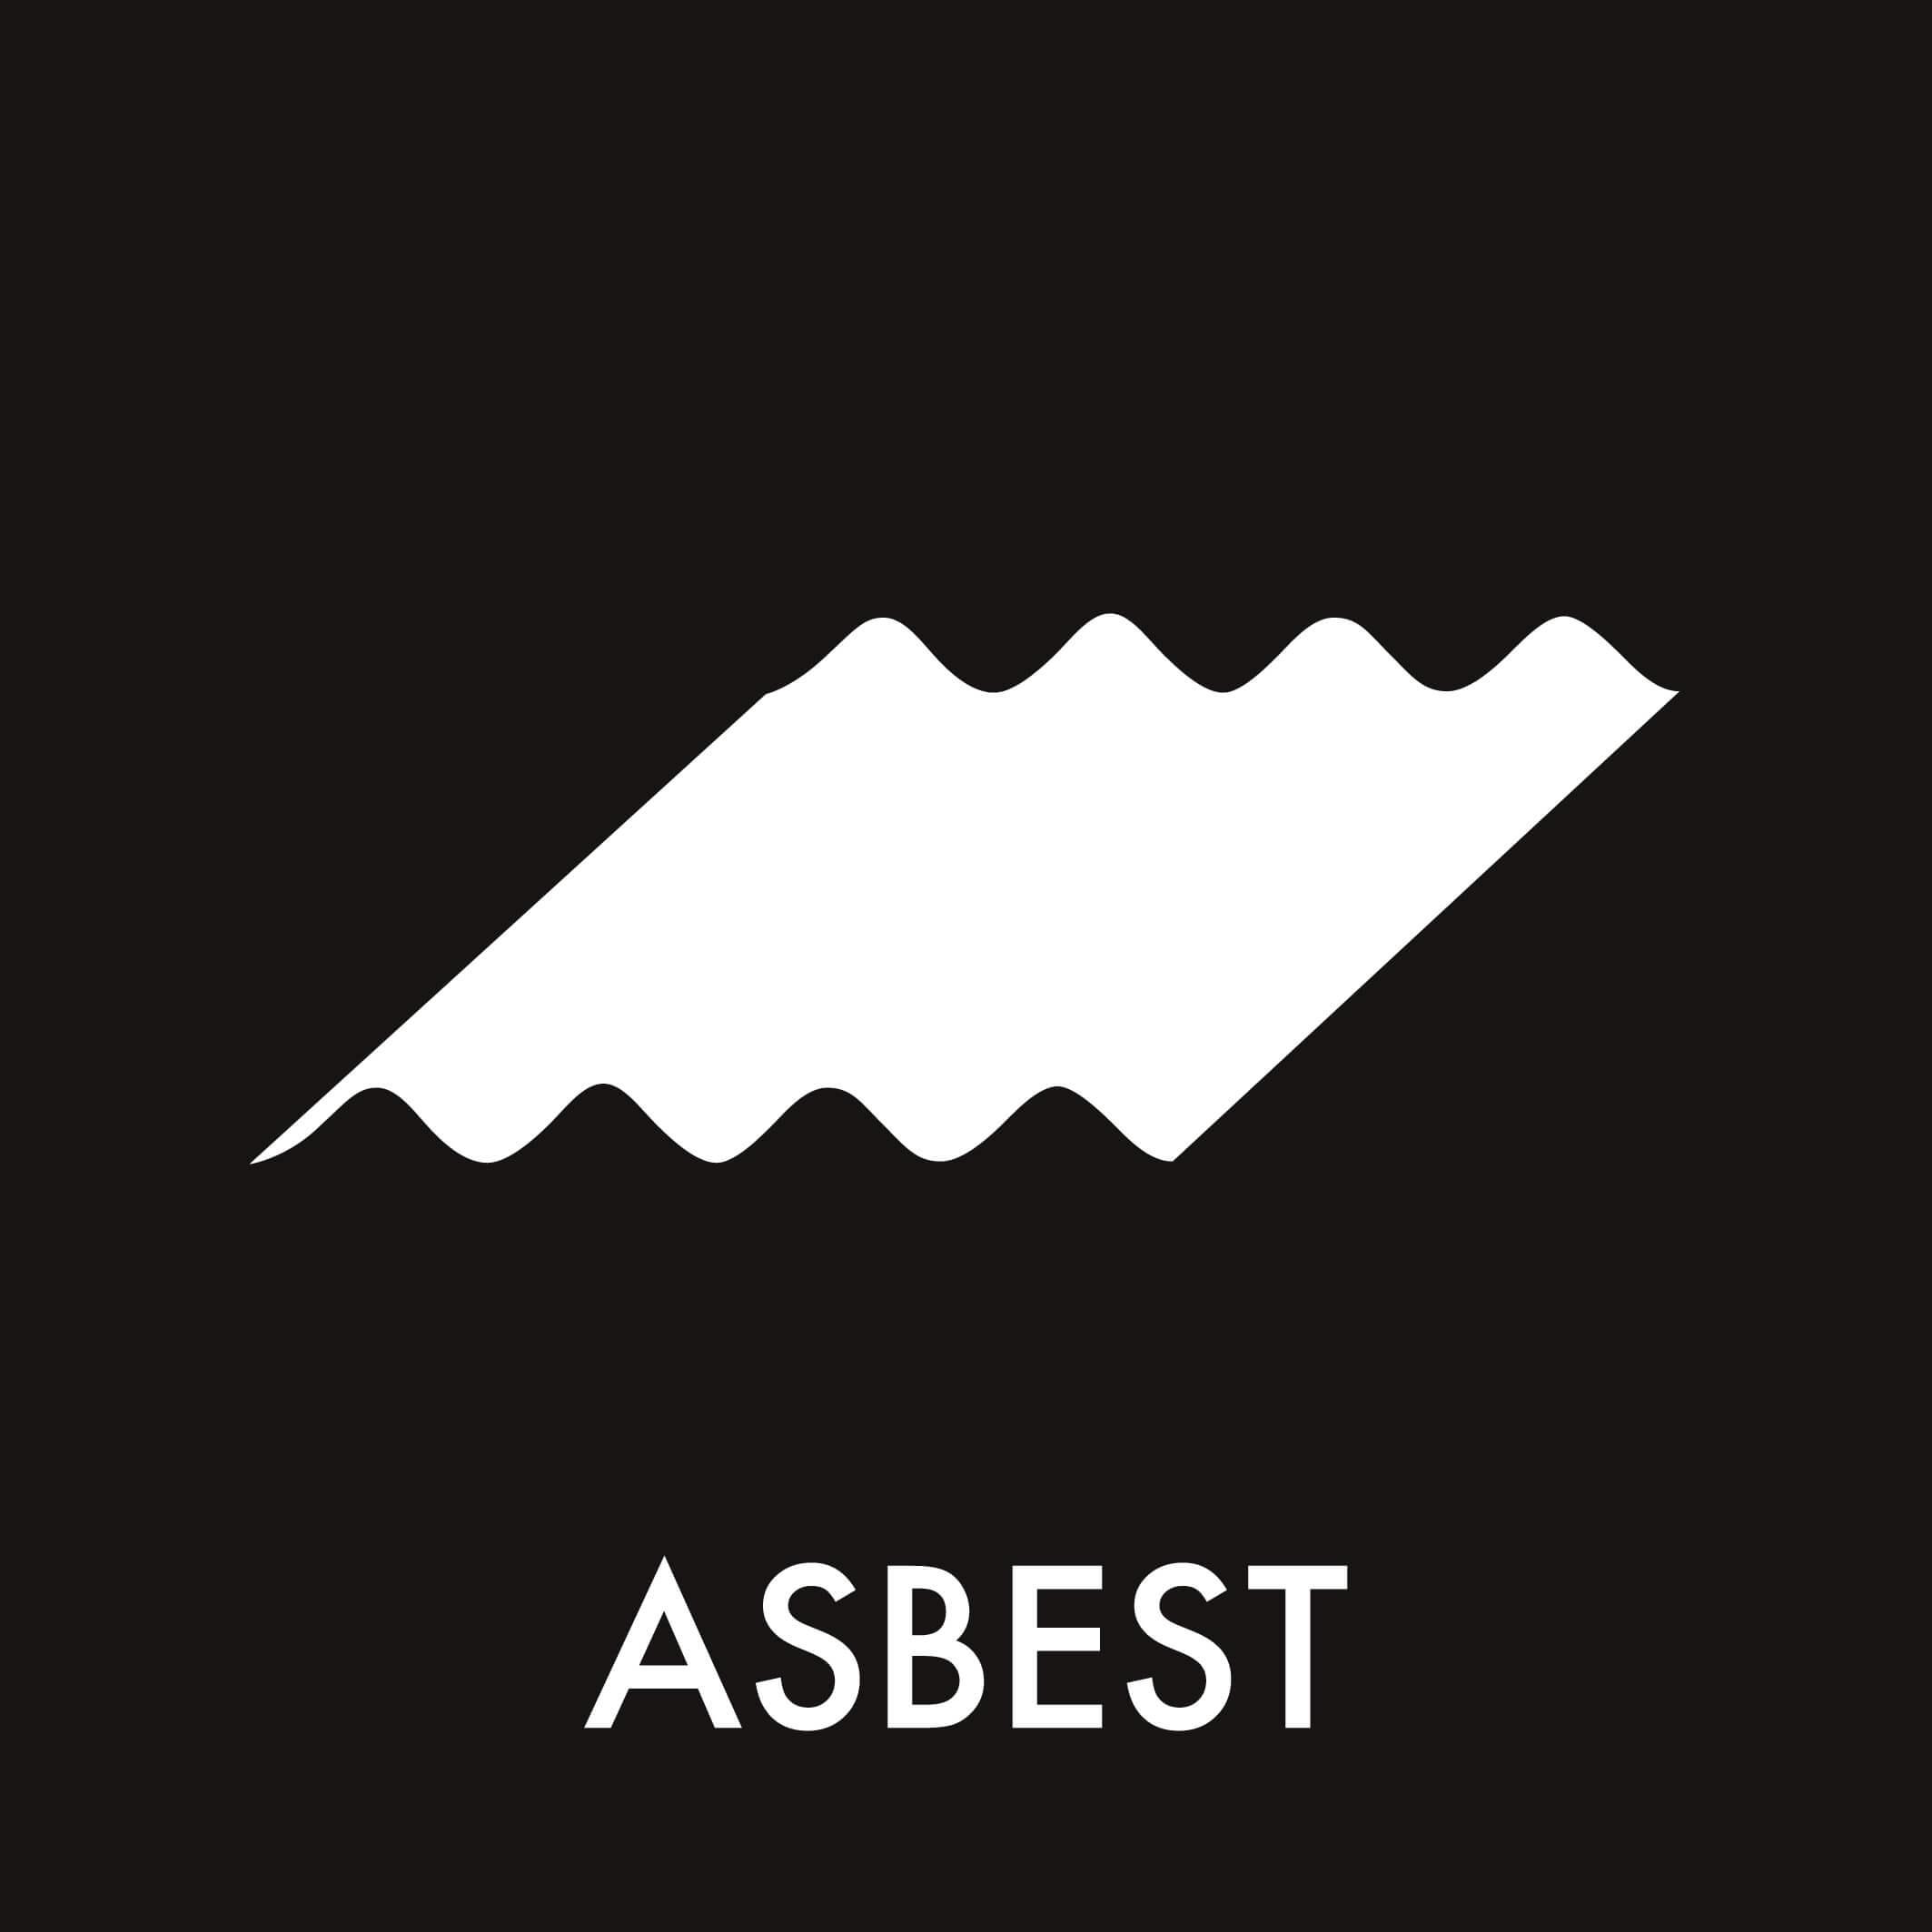 Dansk Affaldssortering - Asbest sort